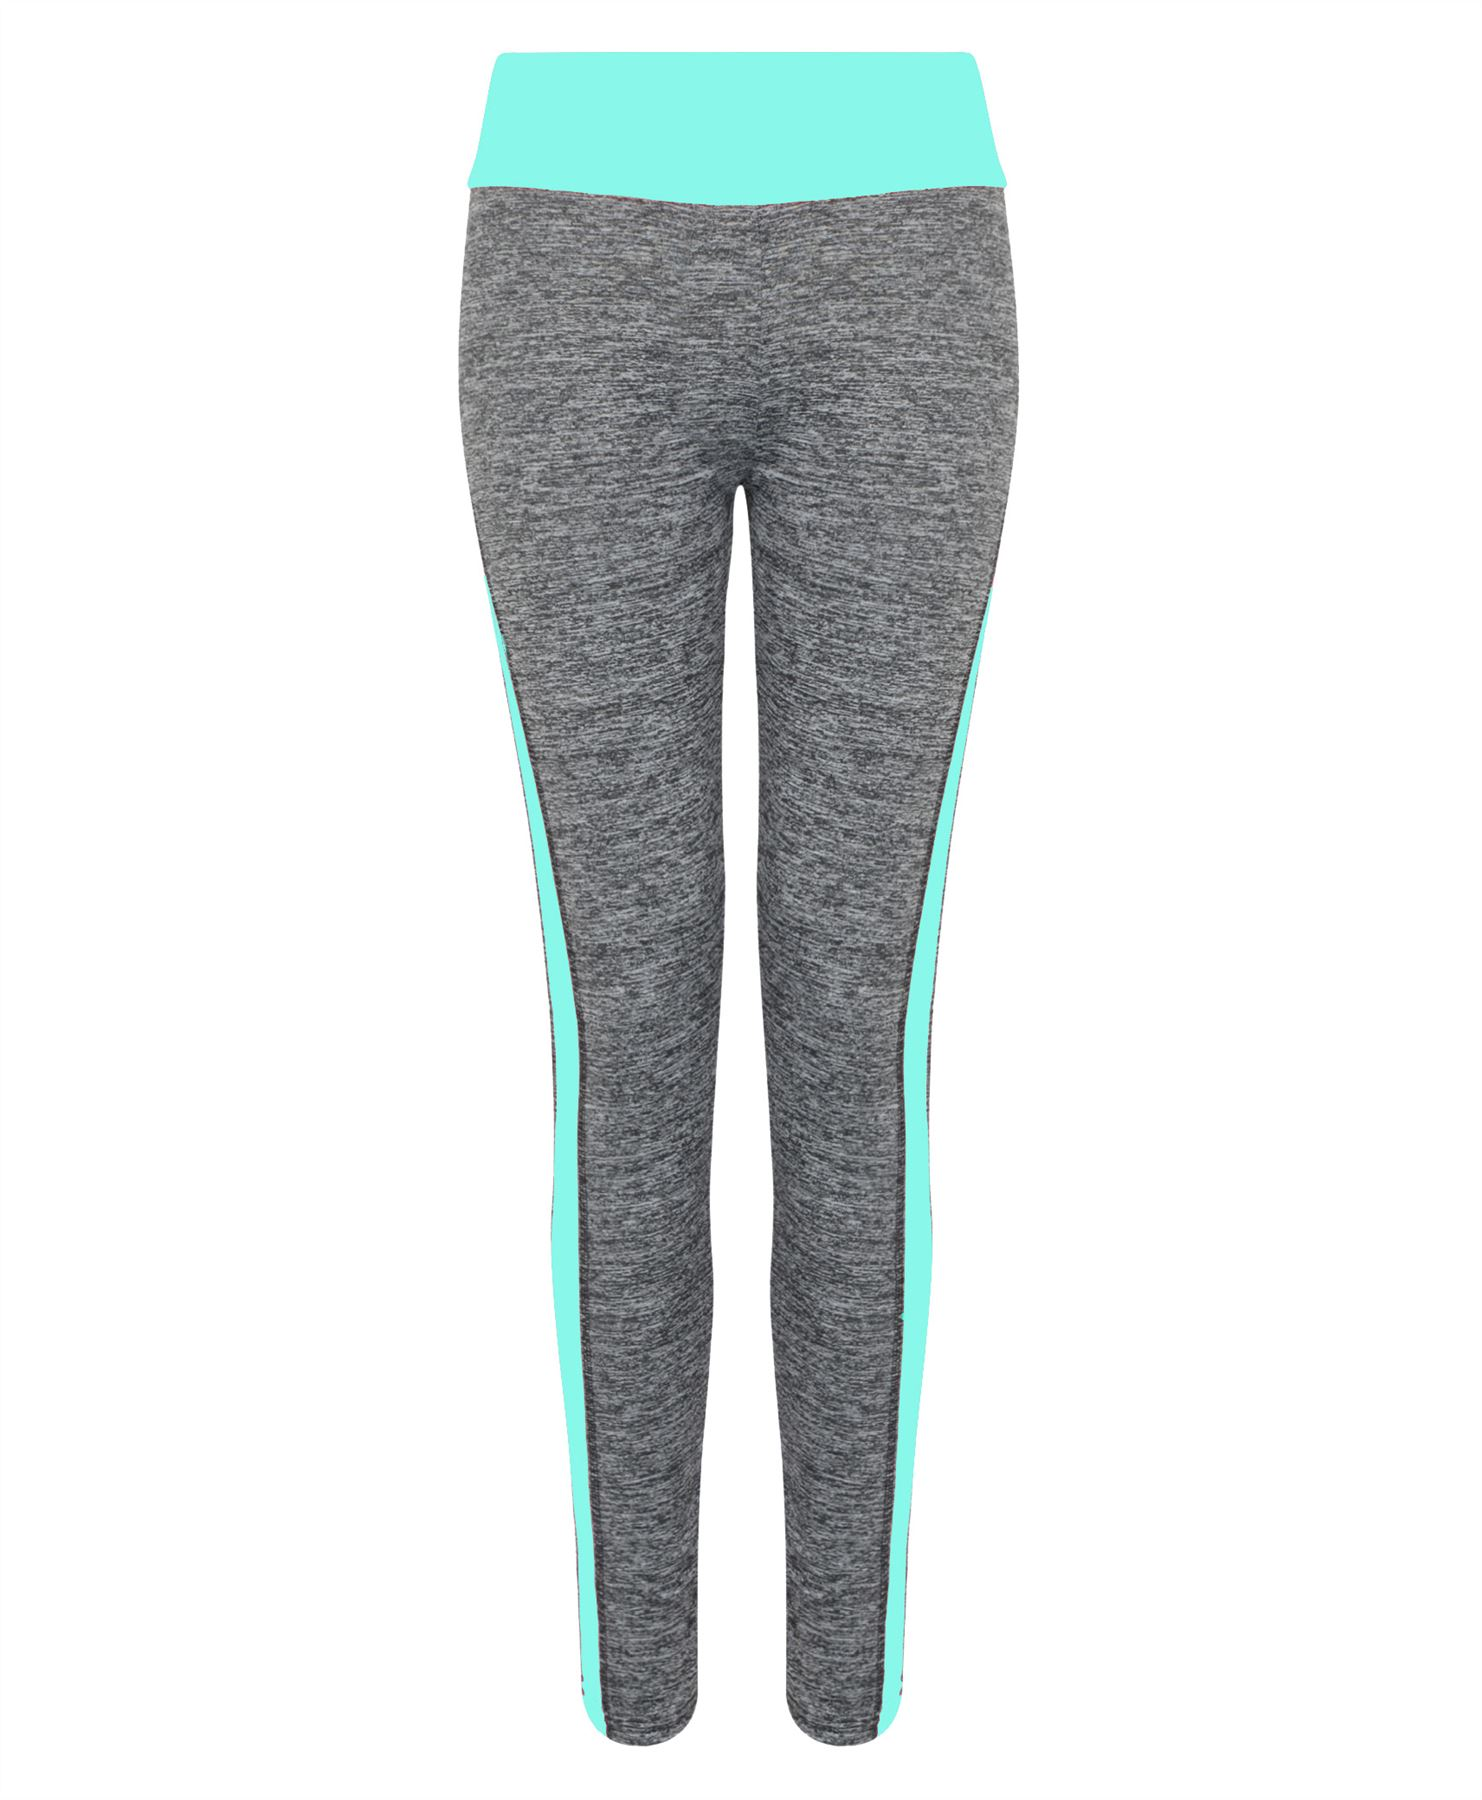 Ladies Gym Sports Jacket or Leggings Women Active Wear Zip Top Yoga Pants S-XL